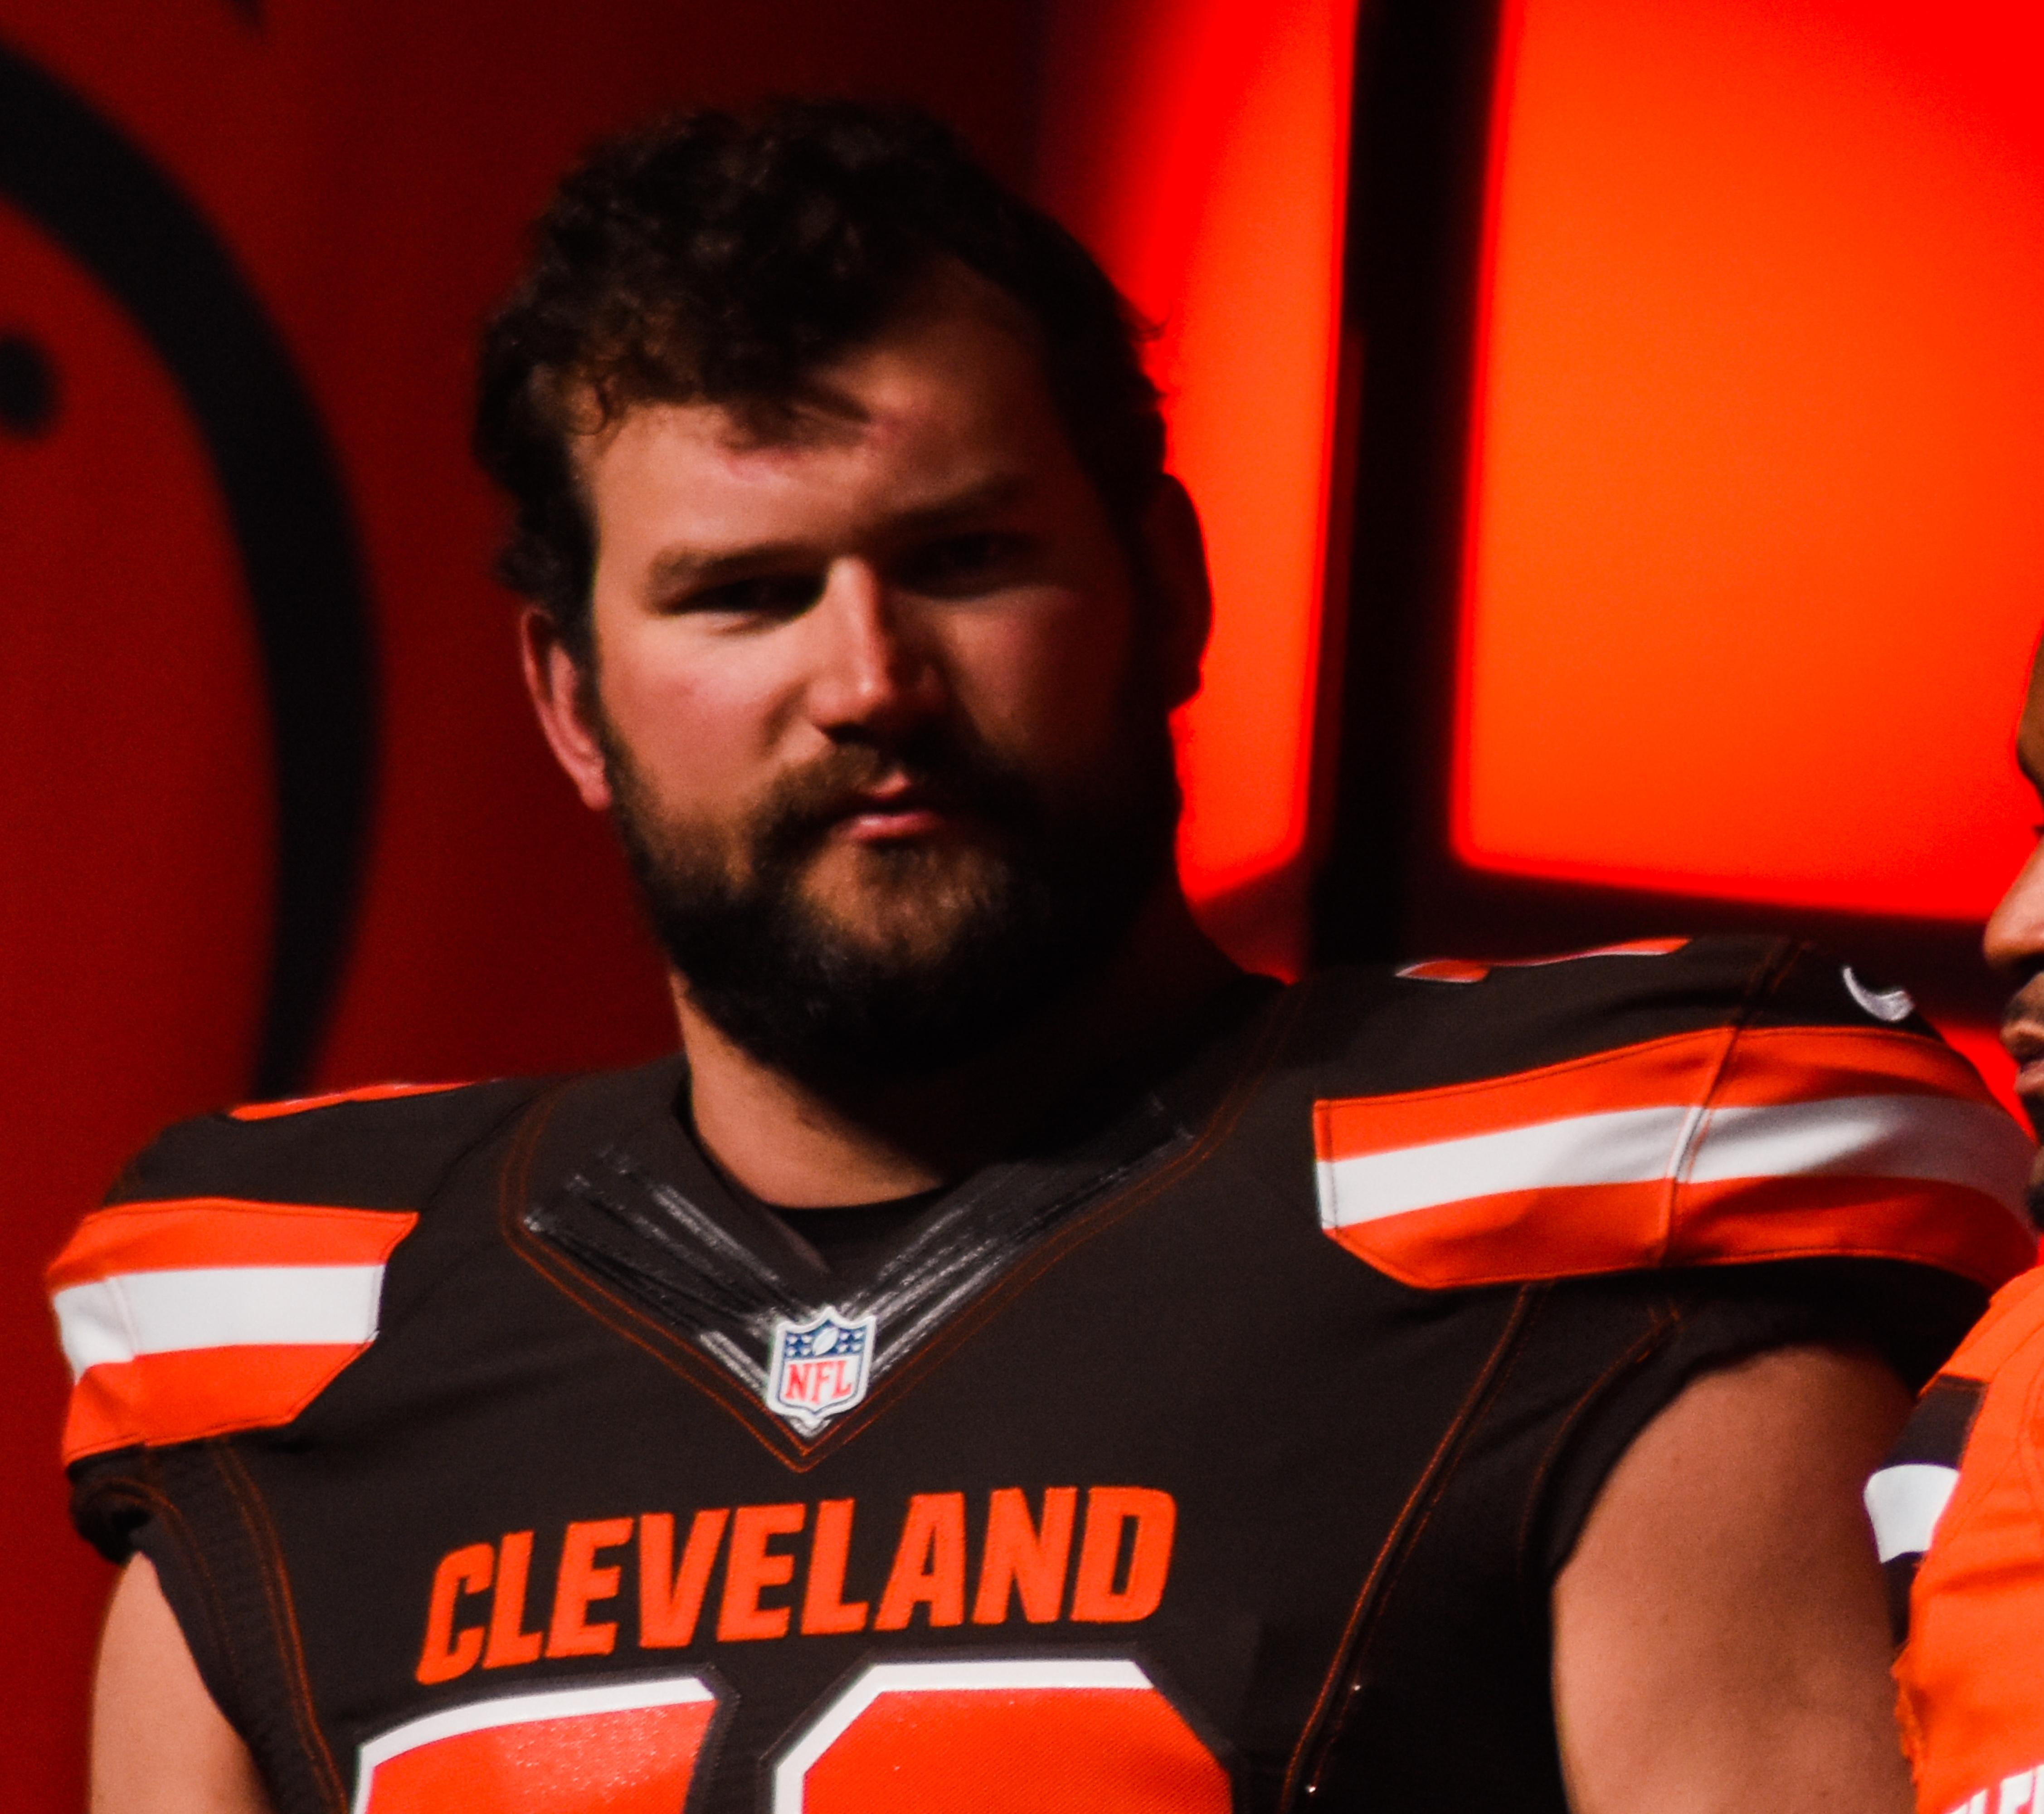 Joe_Thomas_Cleveland_Browns_New_Uniform_Unveiling_(16968332879)